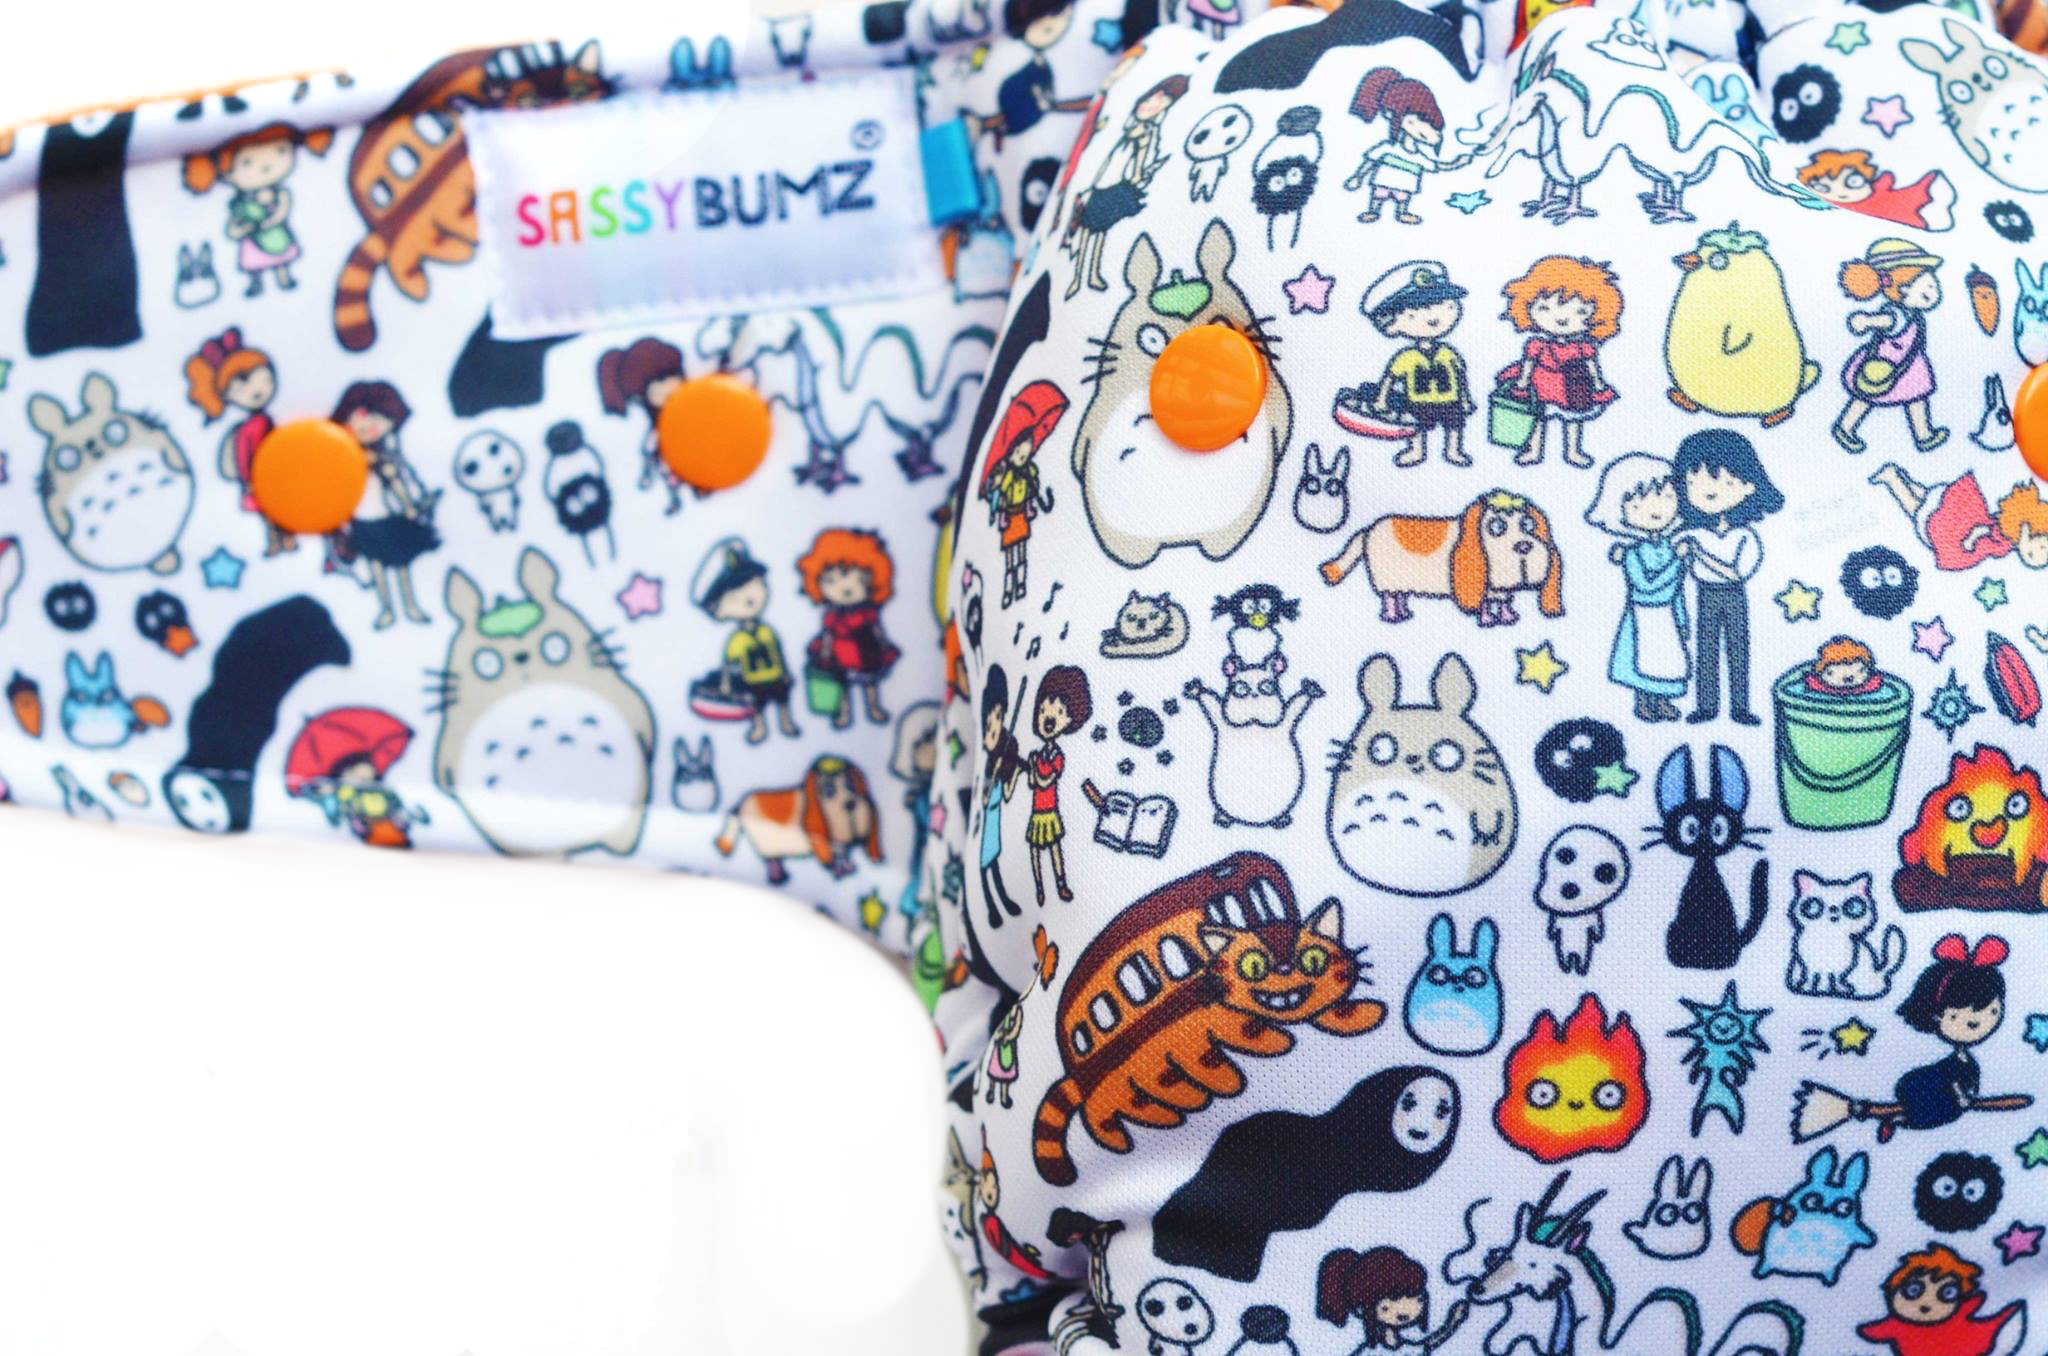 Studio Ghibli cloth diaper by Sassy Bumz